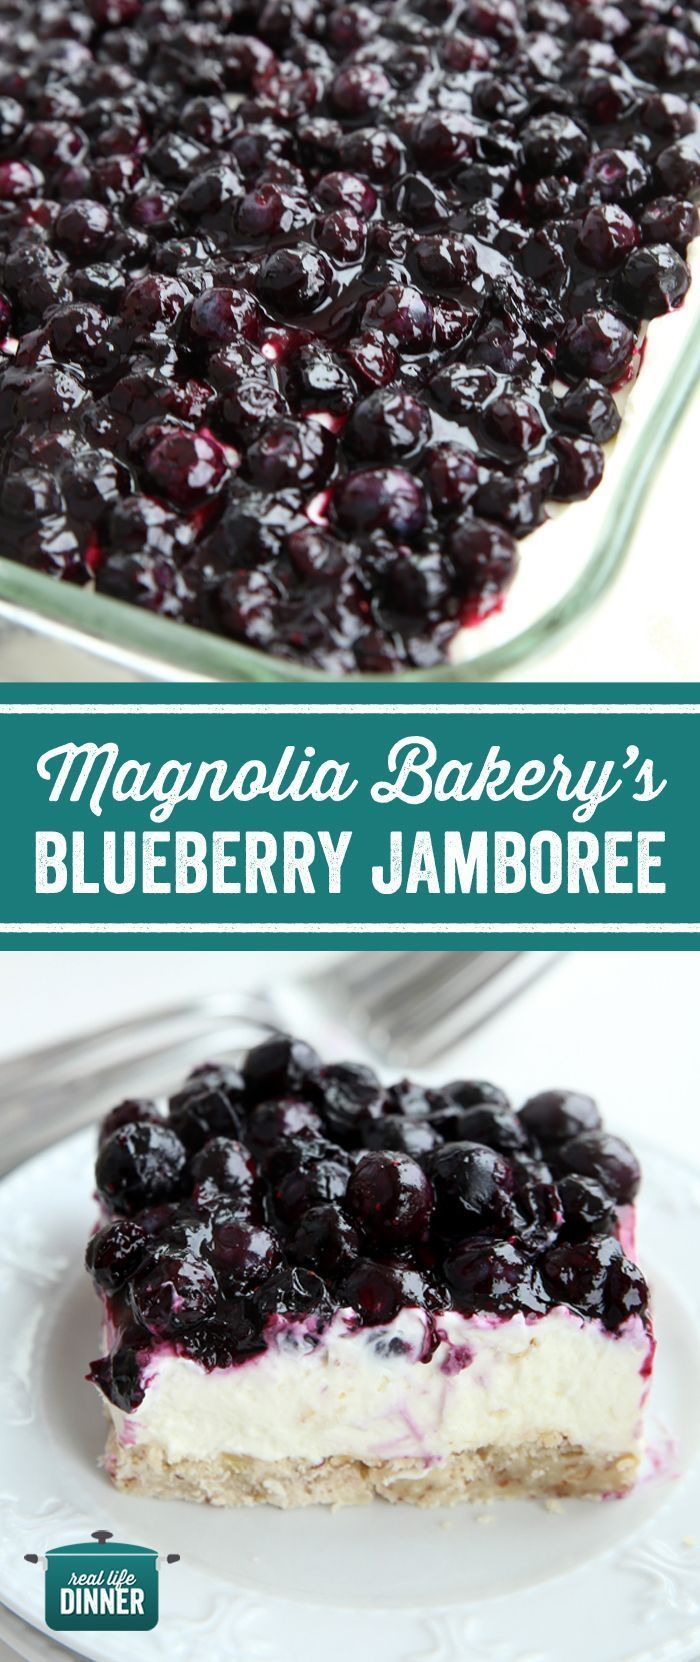 Photo of Magnolia Bakery Blueberry Jamboree – Real Life Dinner